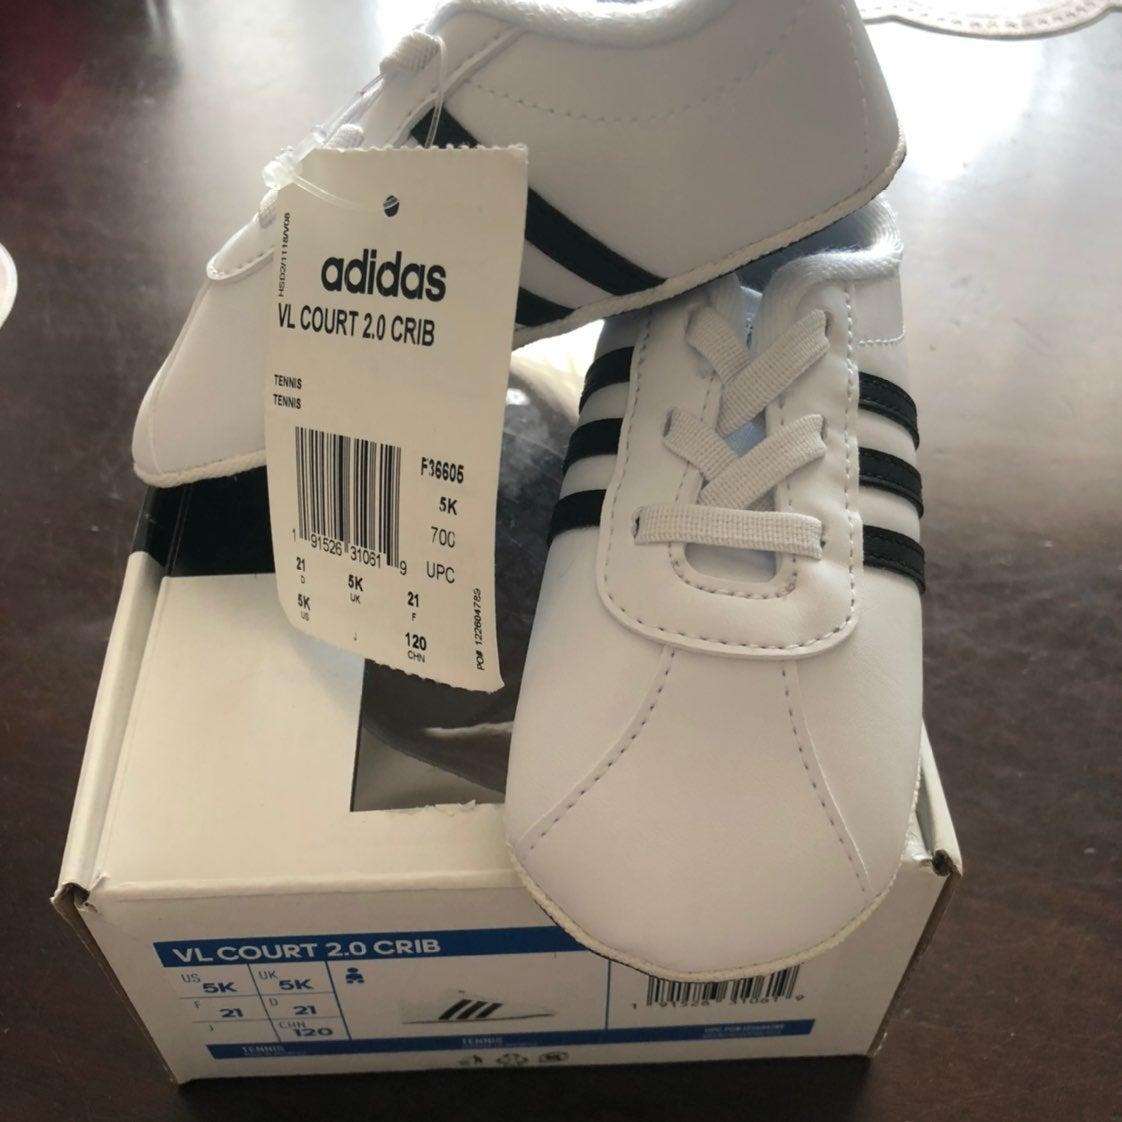 Adidas VL Court 2.0. Crib